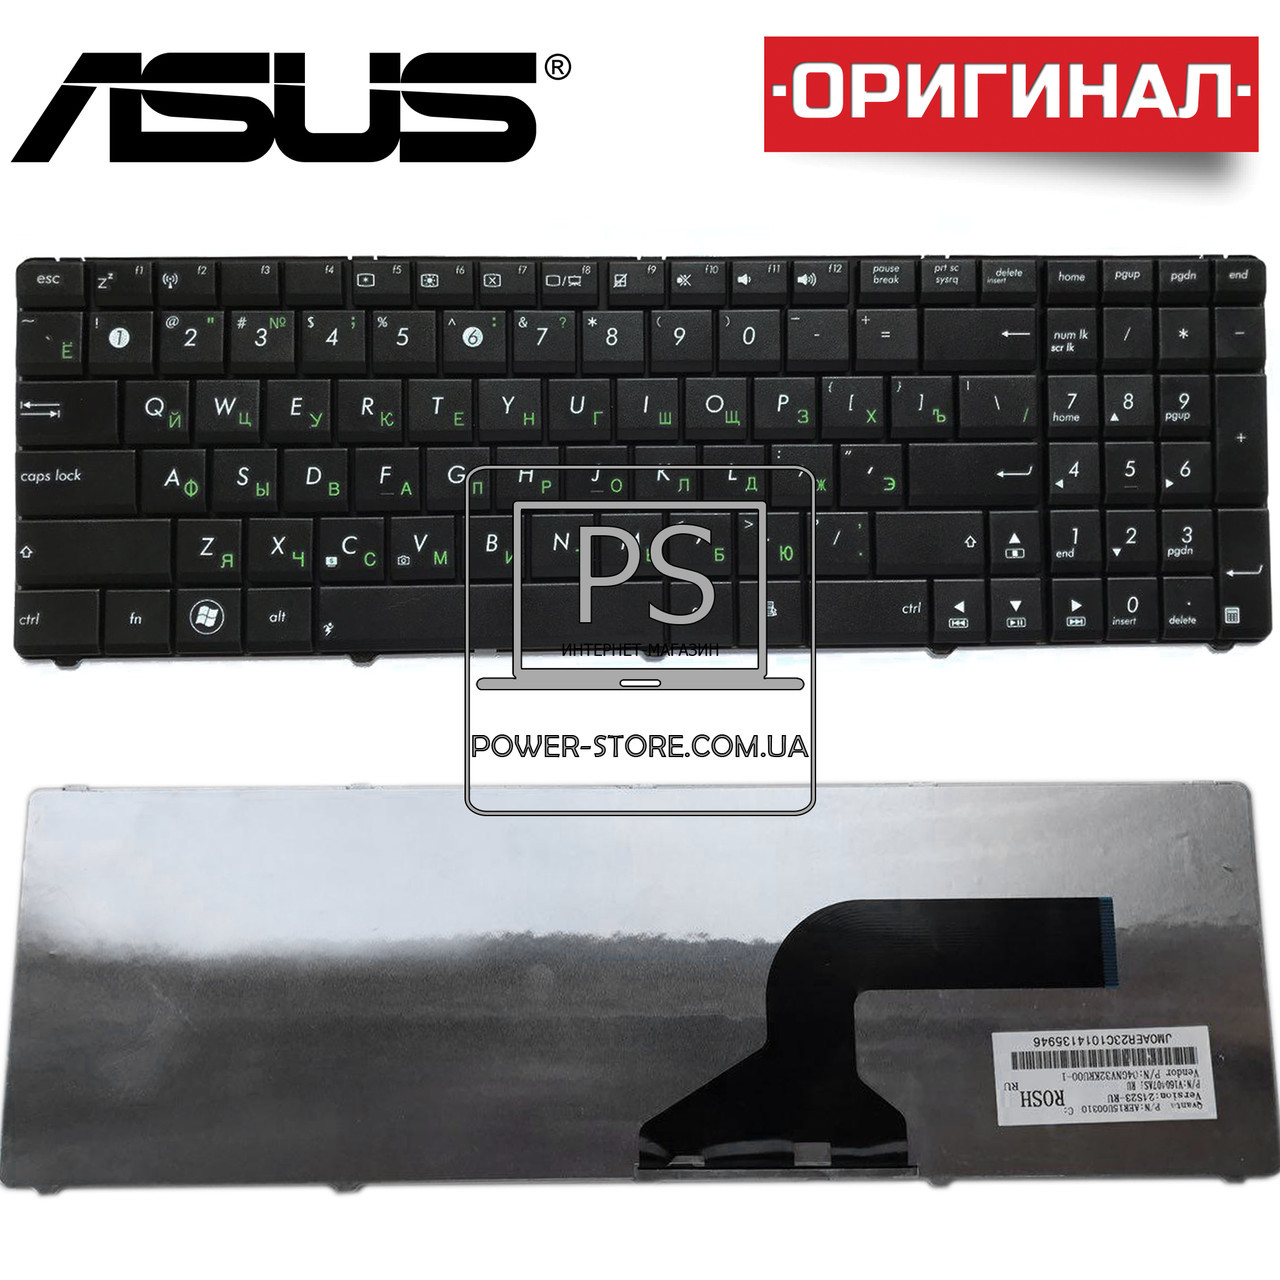 Клавиатура для ноутбука ASUS  04GNQX1KPO00-2, 04GNQX1KRU00-1, 04GNQX1KRU00-2, 04GNQX1KSF00-1,